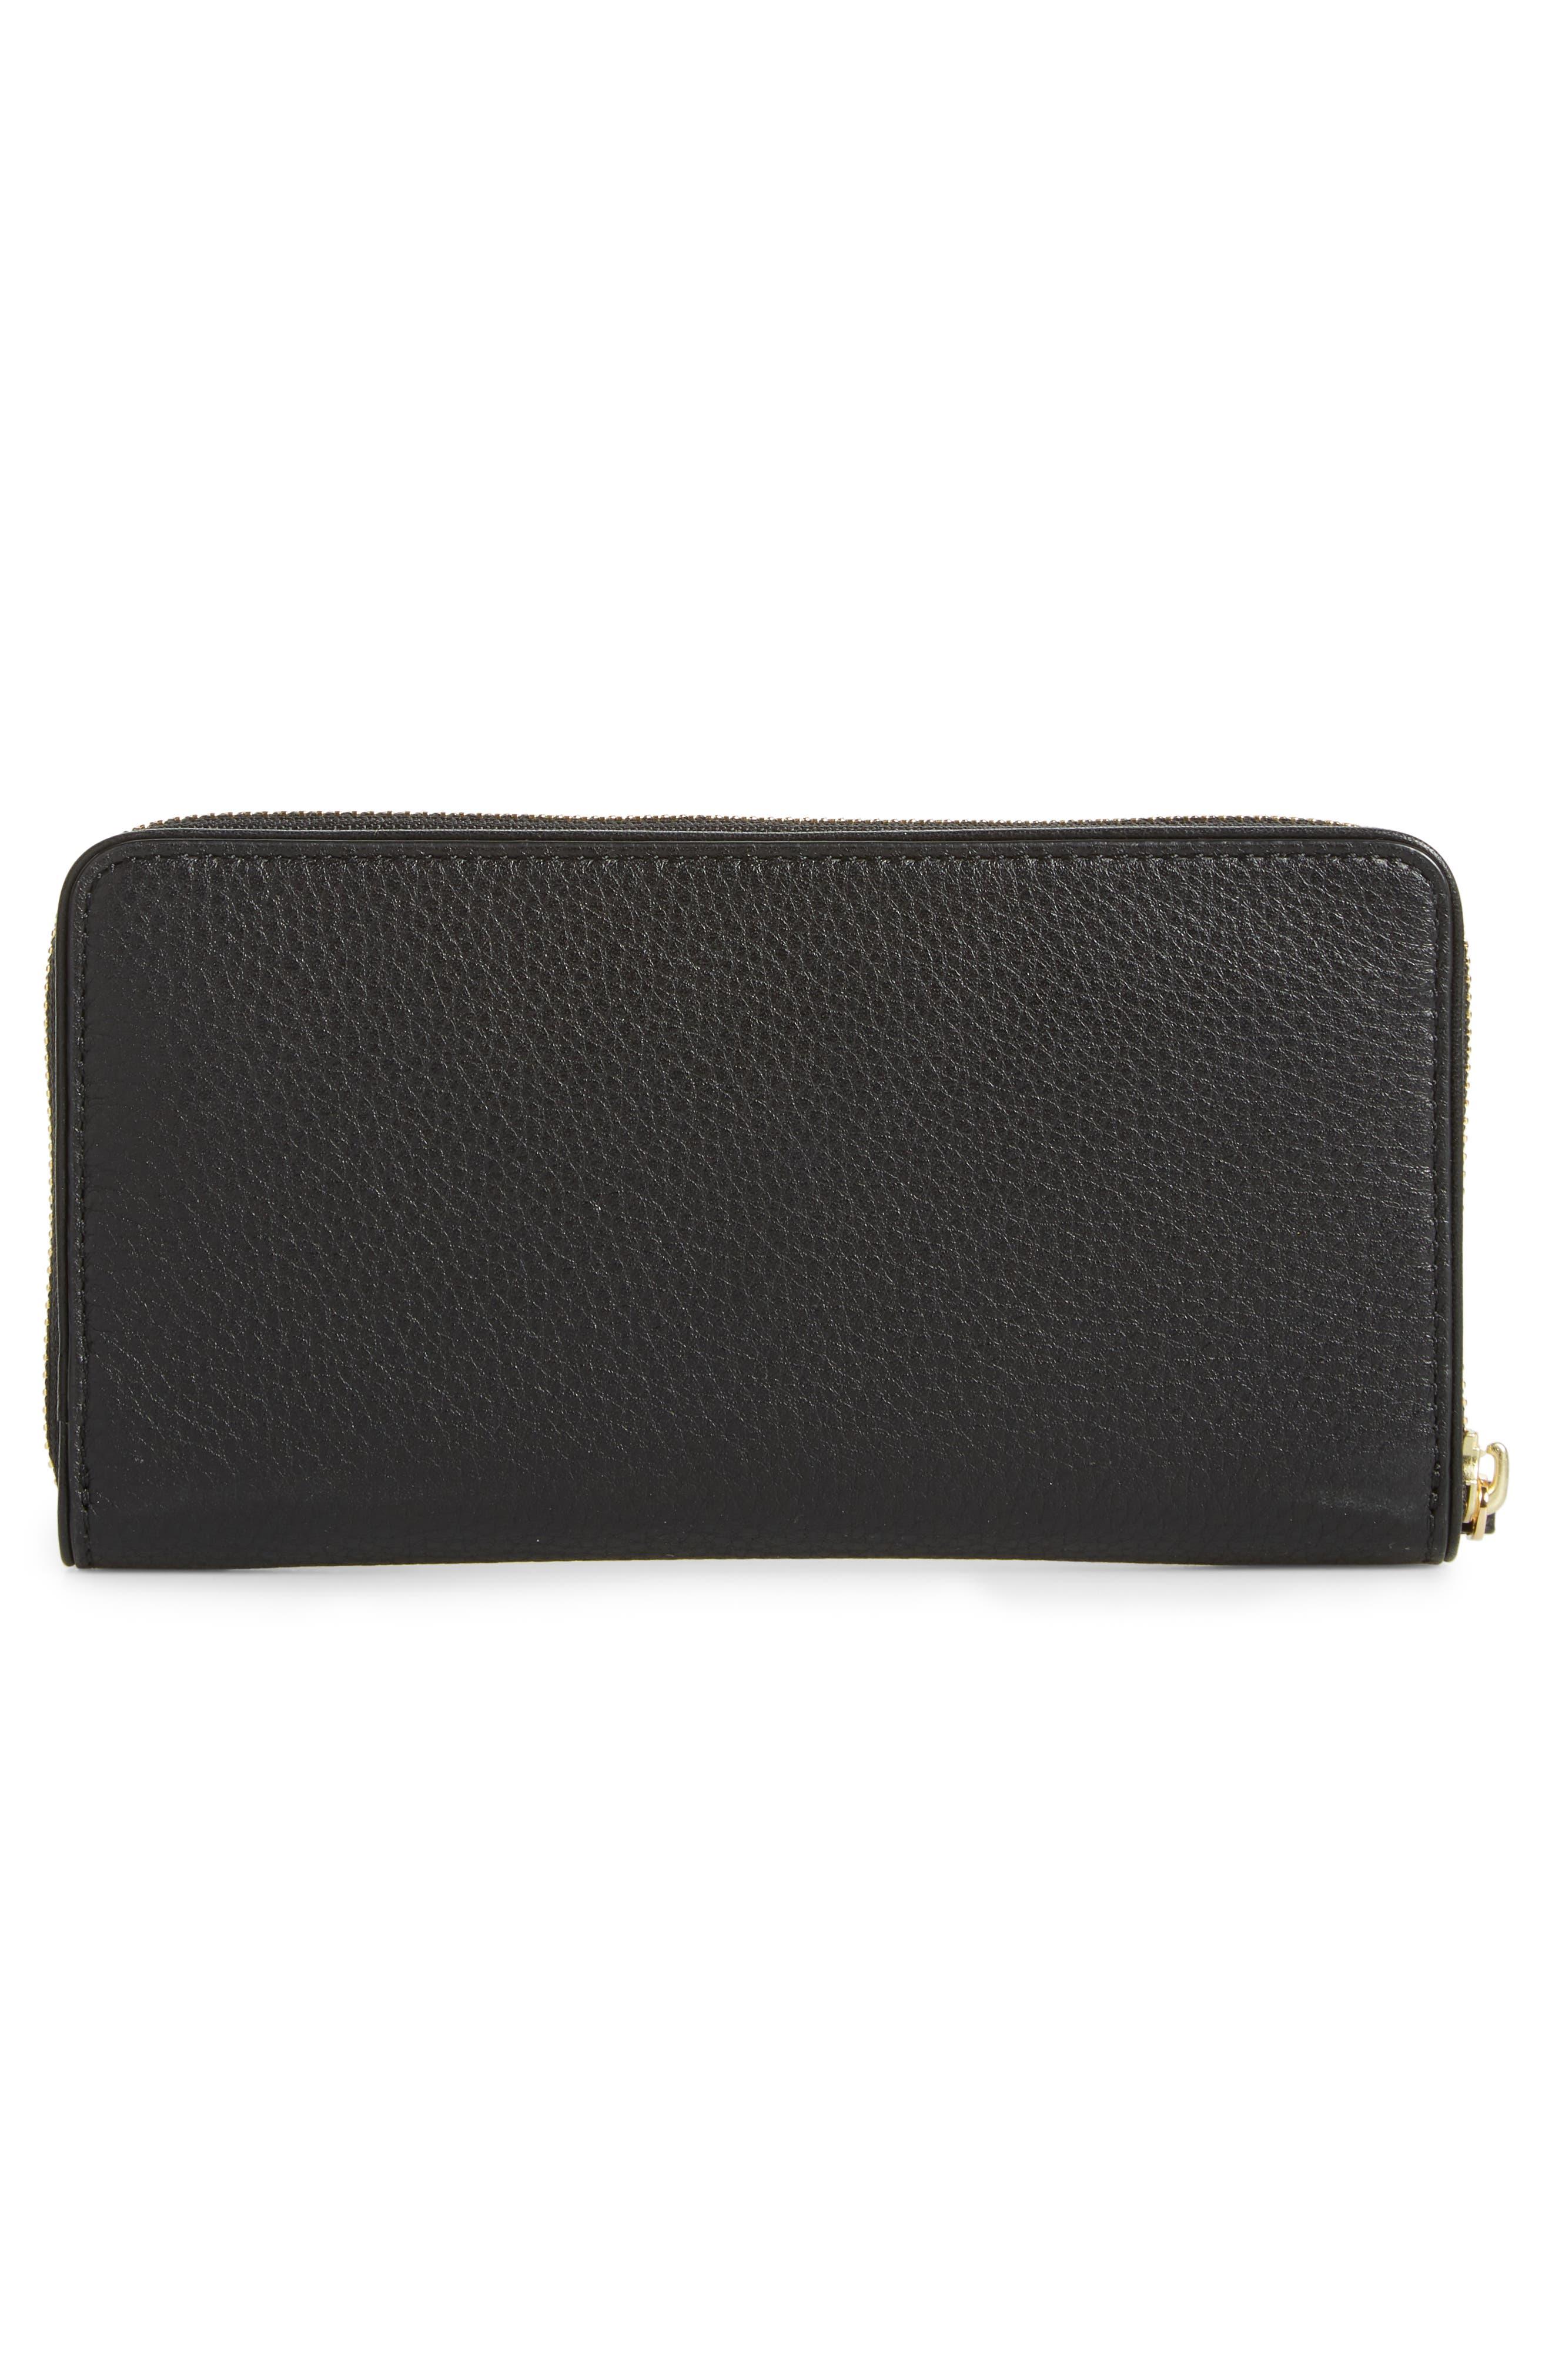 Marsden Leather Zip Around Wallet,                             Alternate thumbnail 7, color,